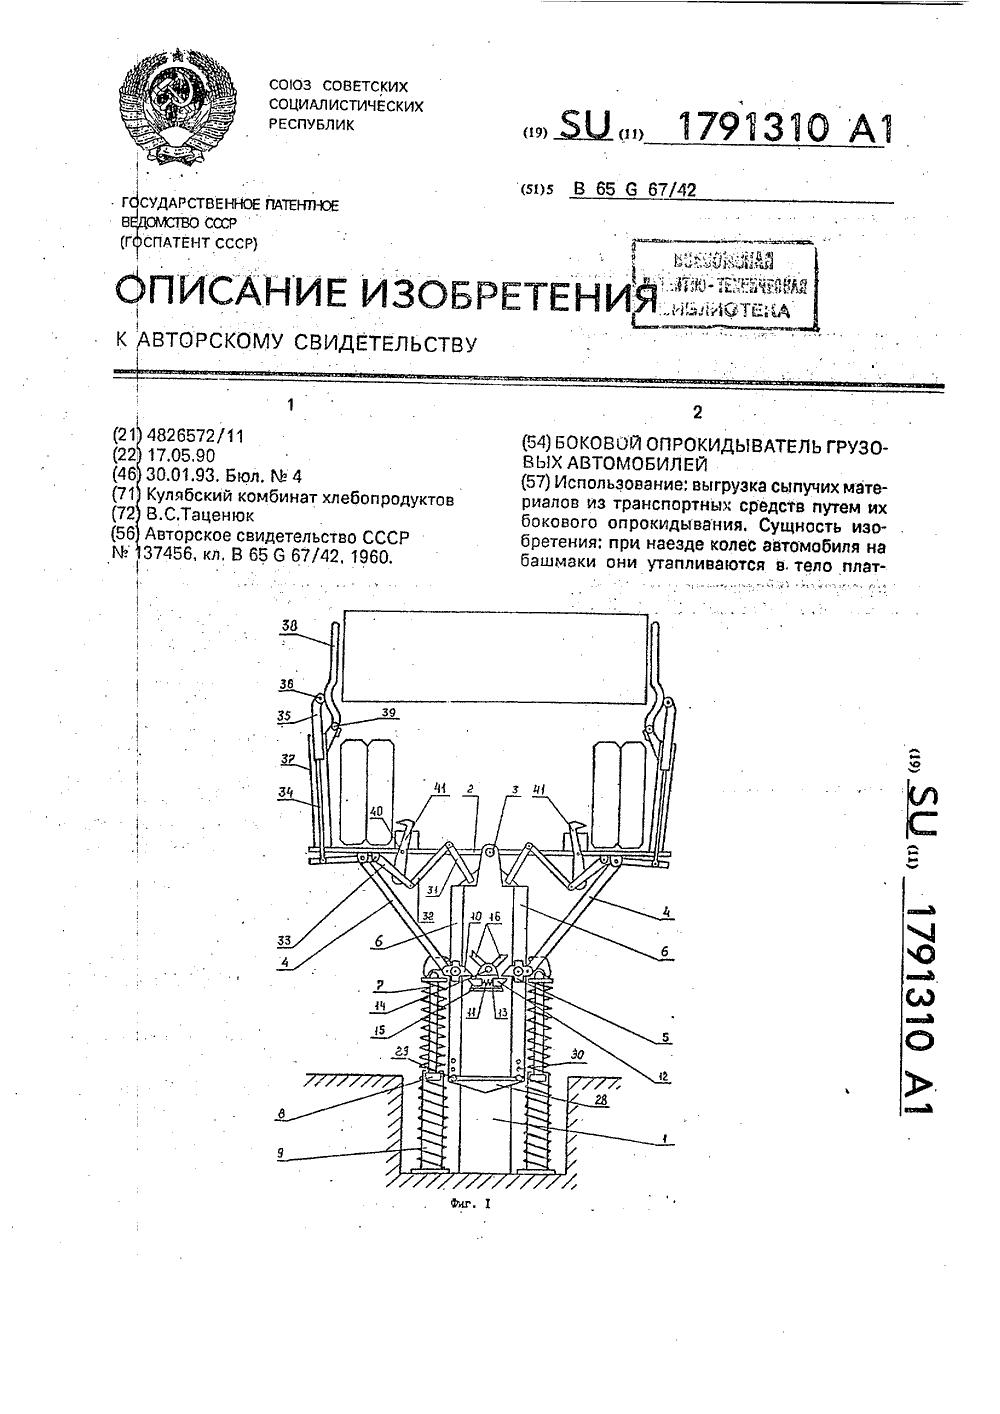 схема опрокидывателя авто